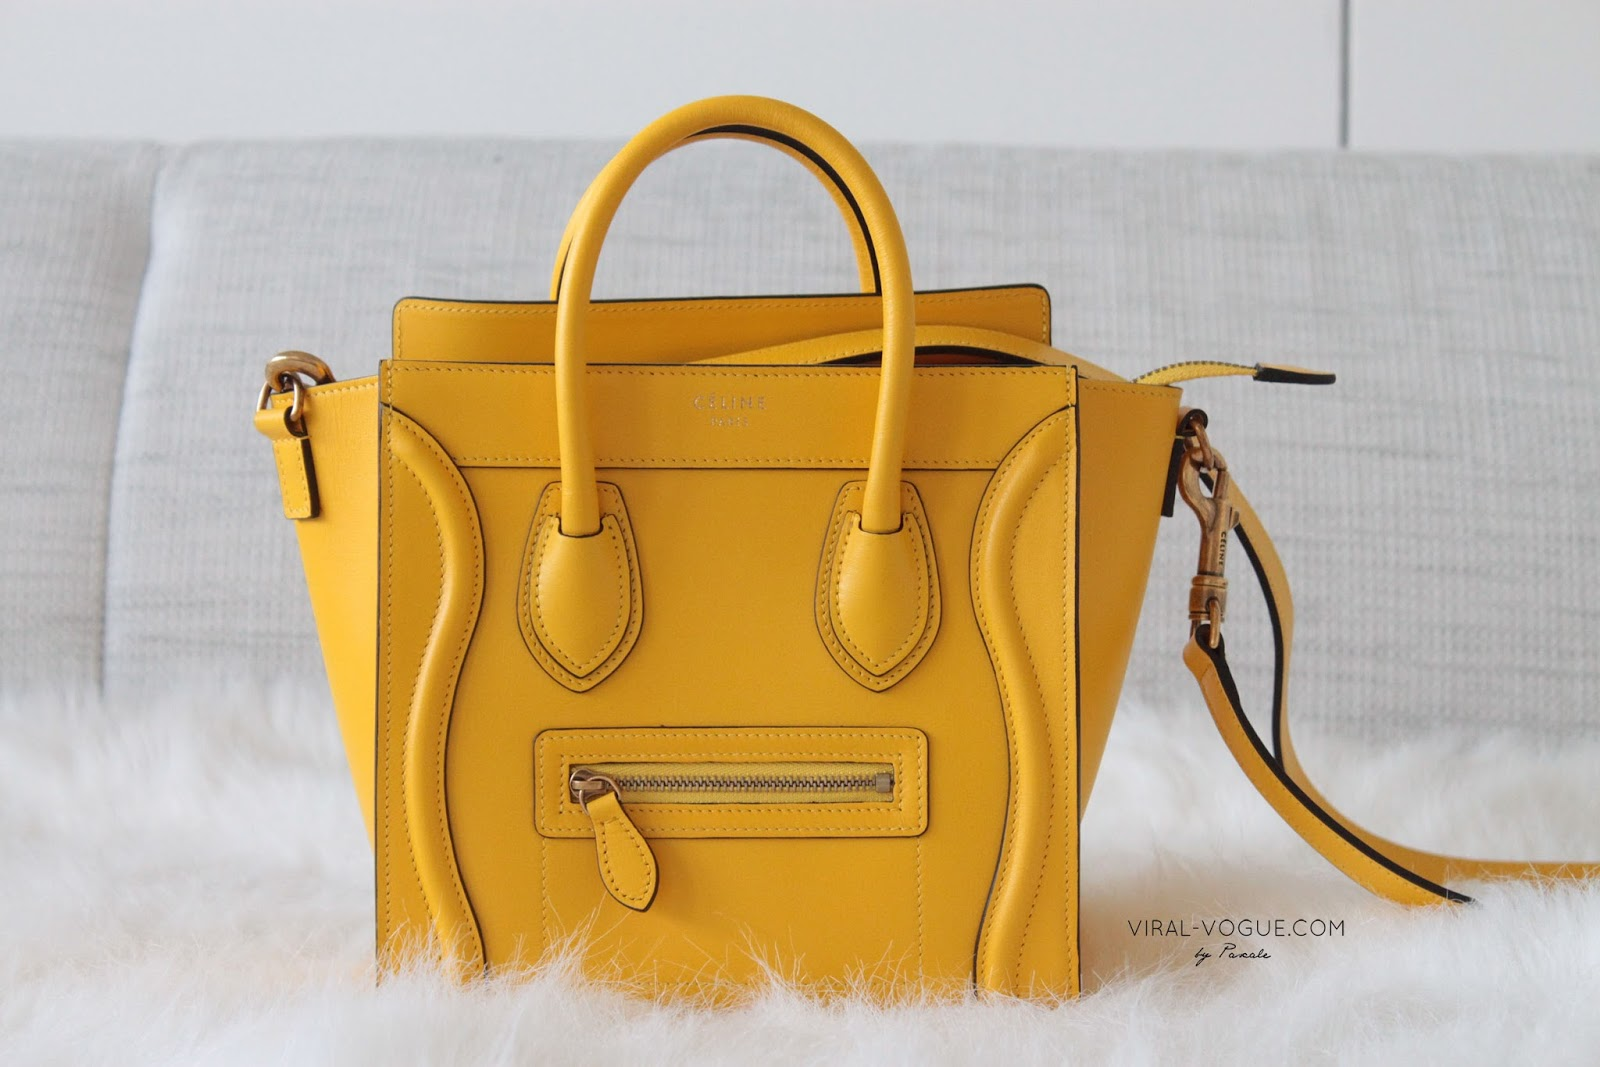 celine handbag prices 2015